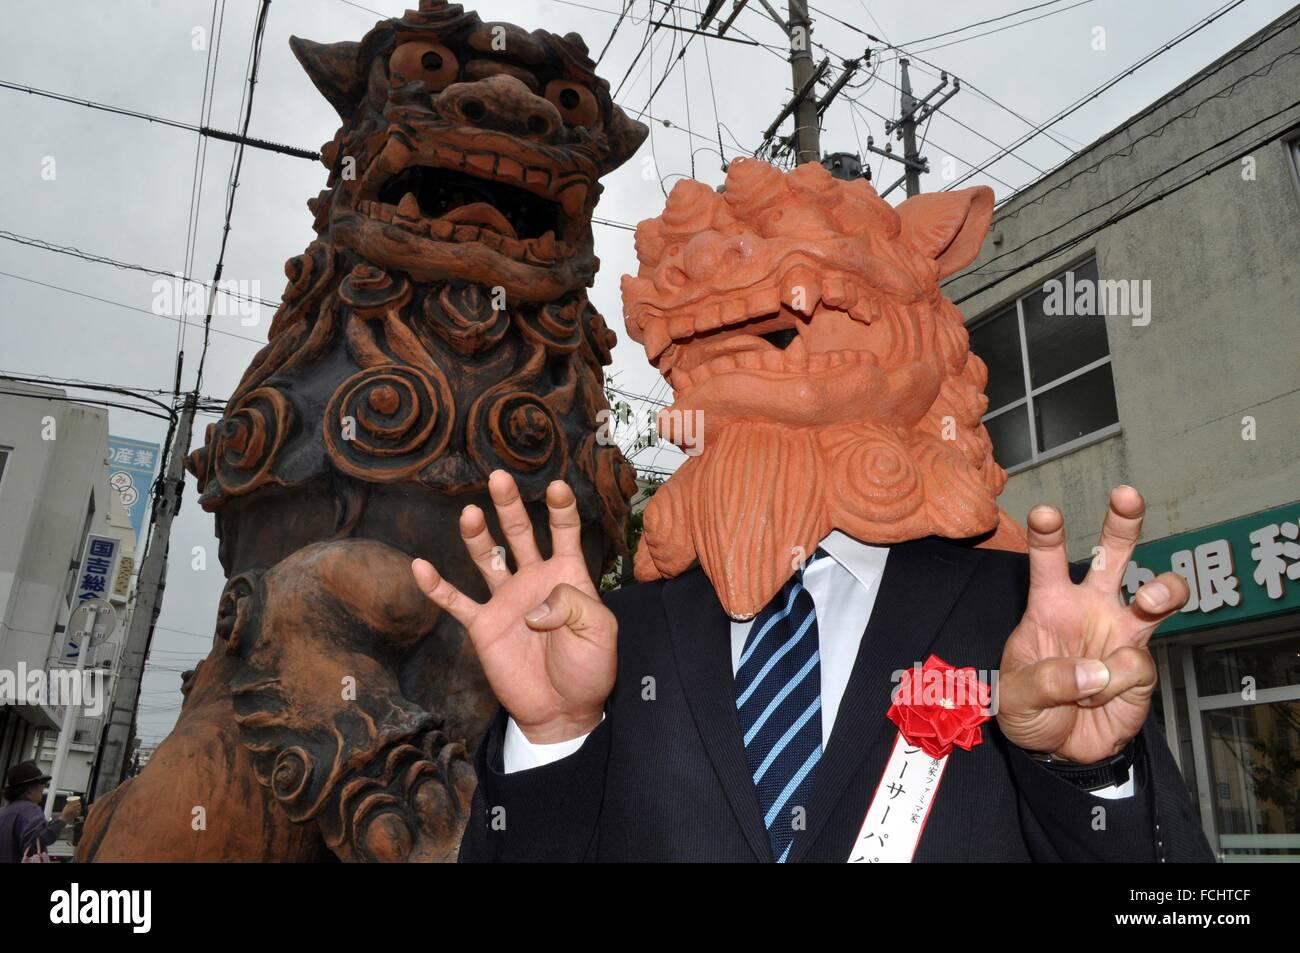 Naha, Okinawa, Japan: performer wearing a Shisa mask in Tsuboya during the ´Shisa Day´. Shisa is a traditional - Stock Image